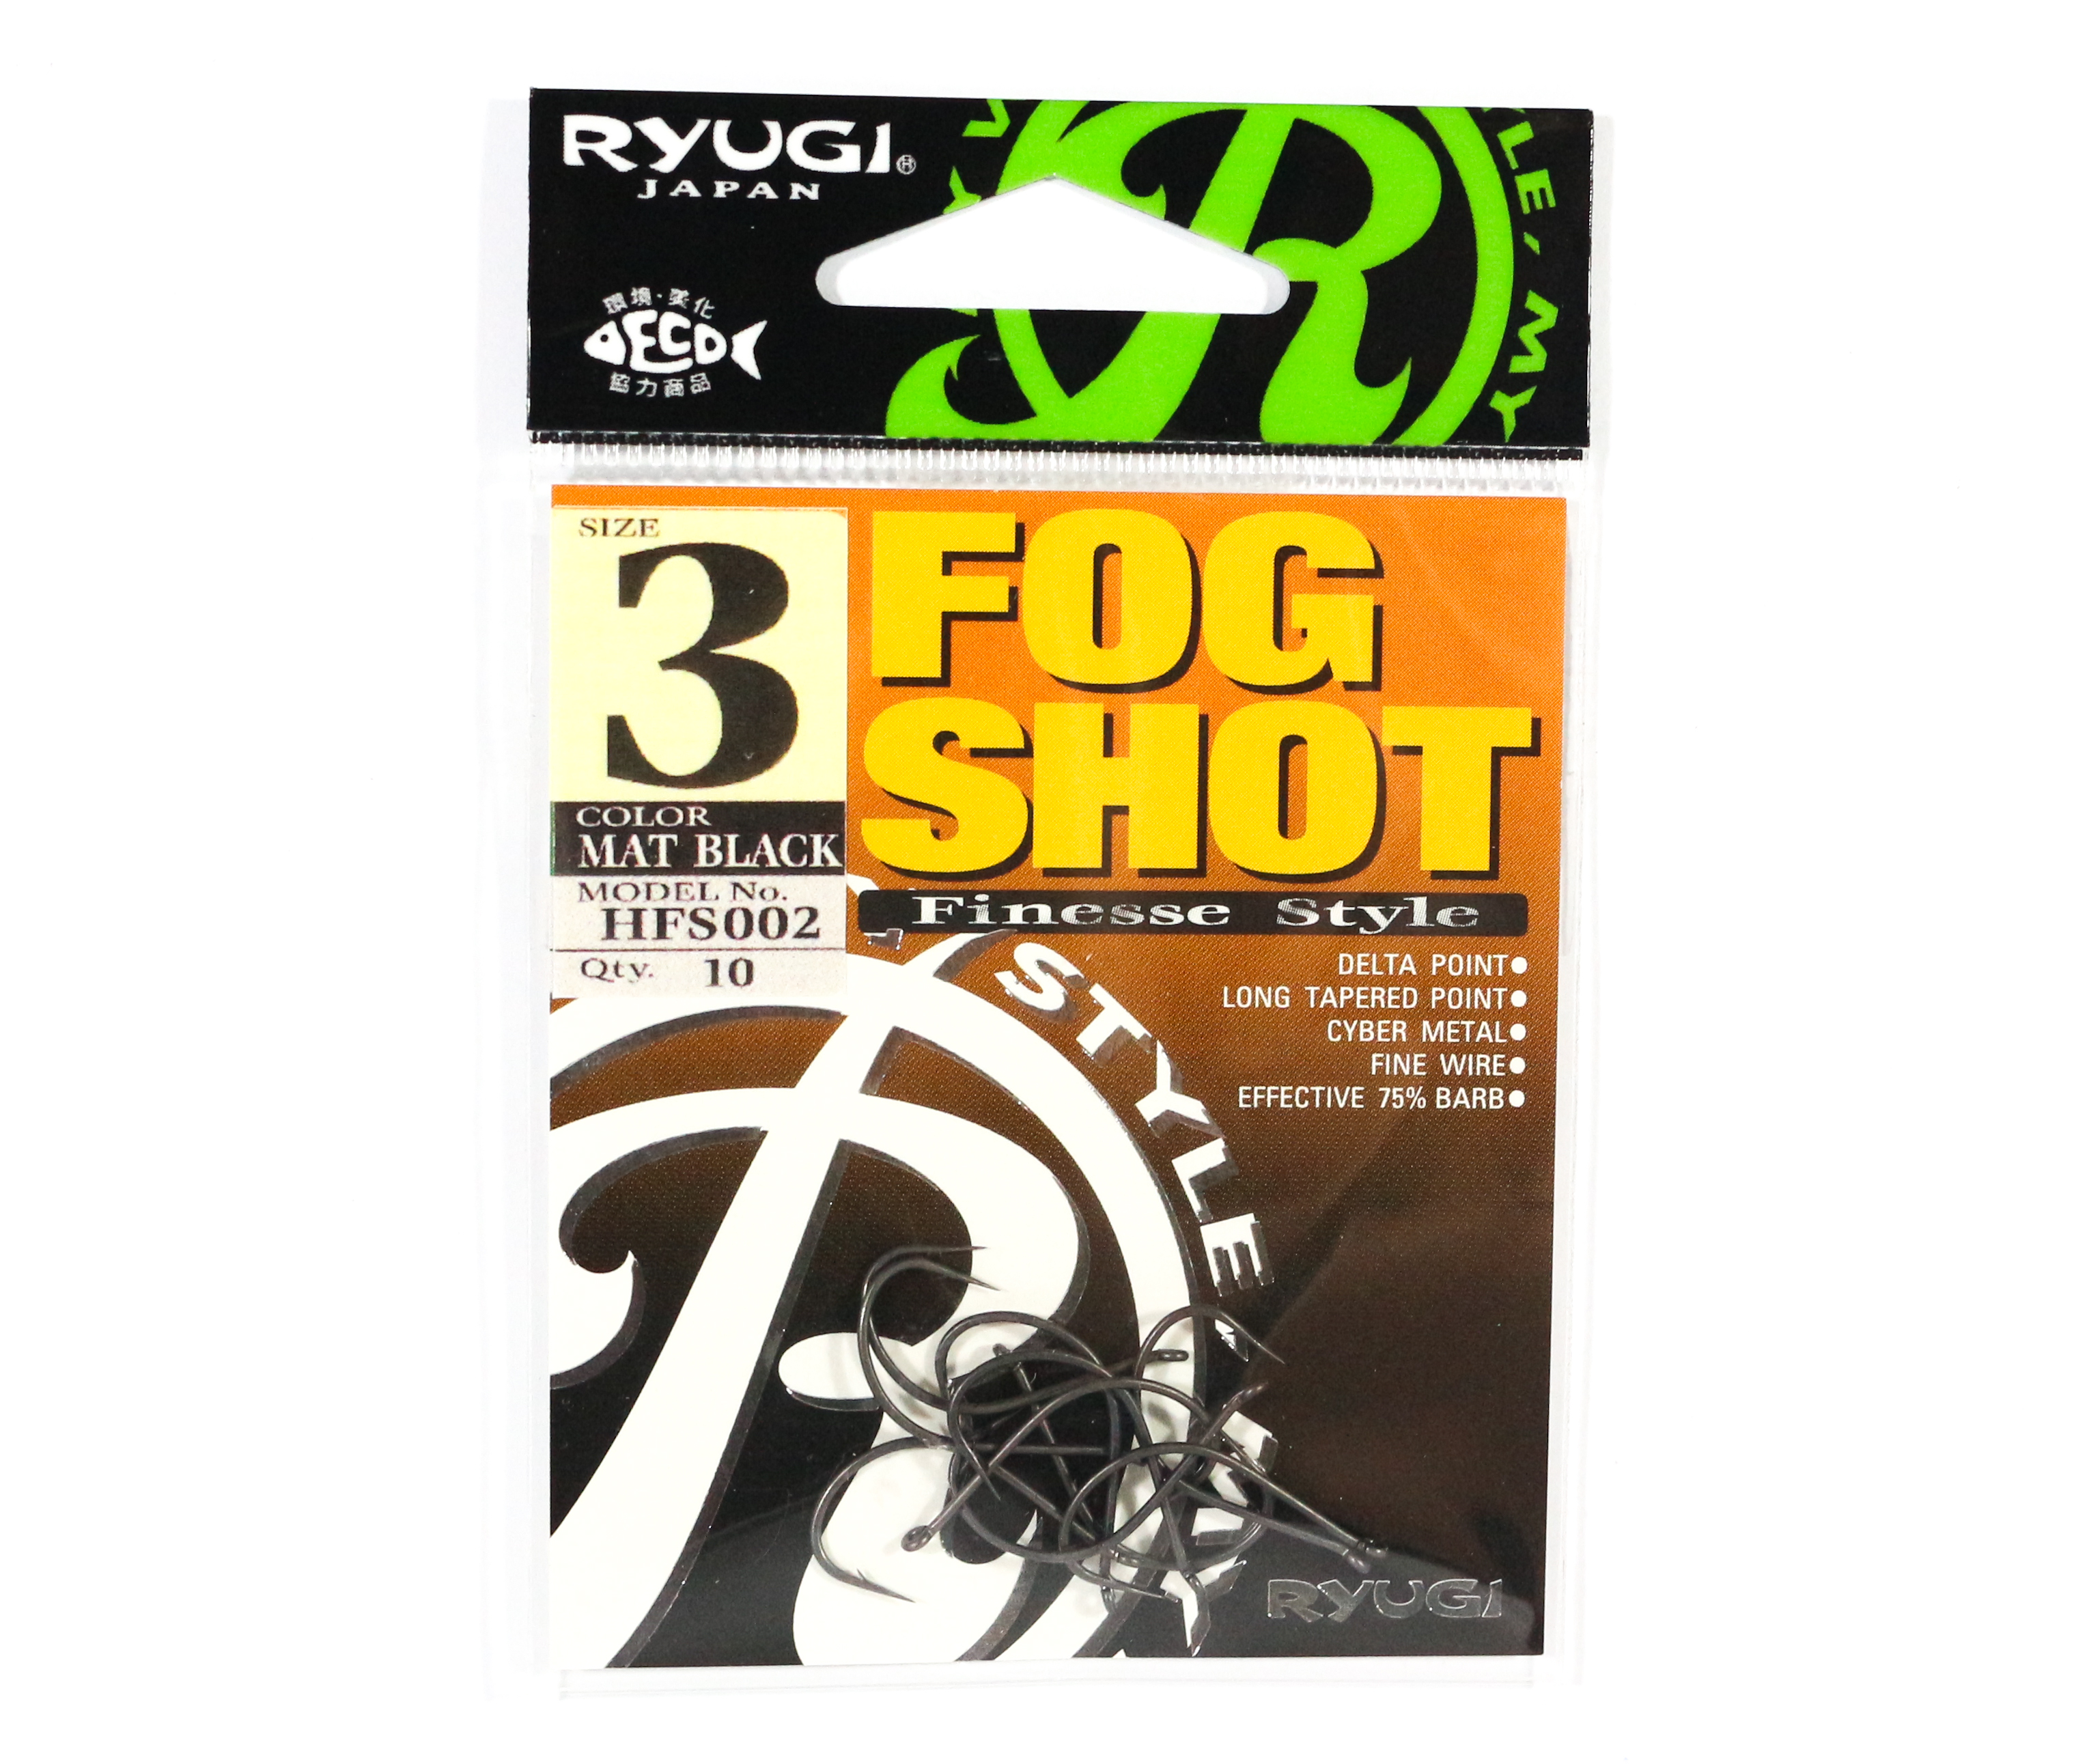 Ryugi HFS002 Fog Shot Finesse Hook Size 3 (0423)